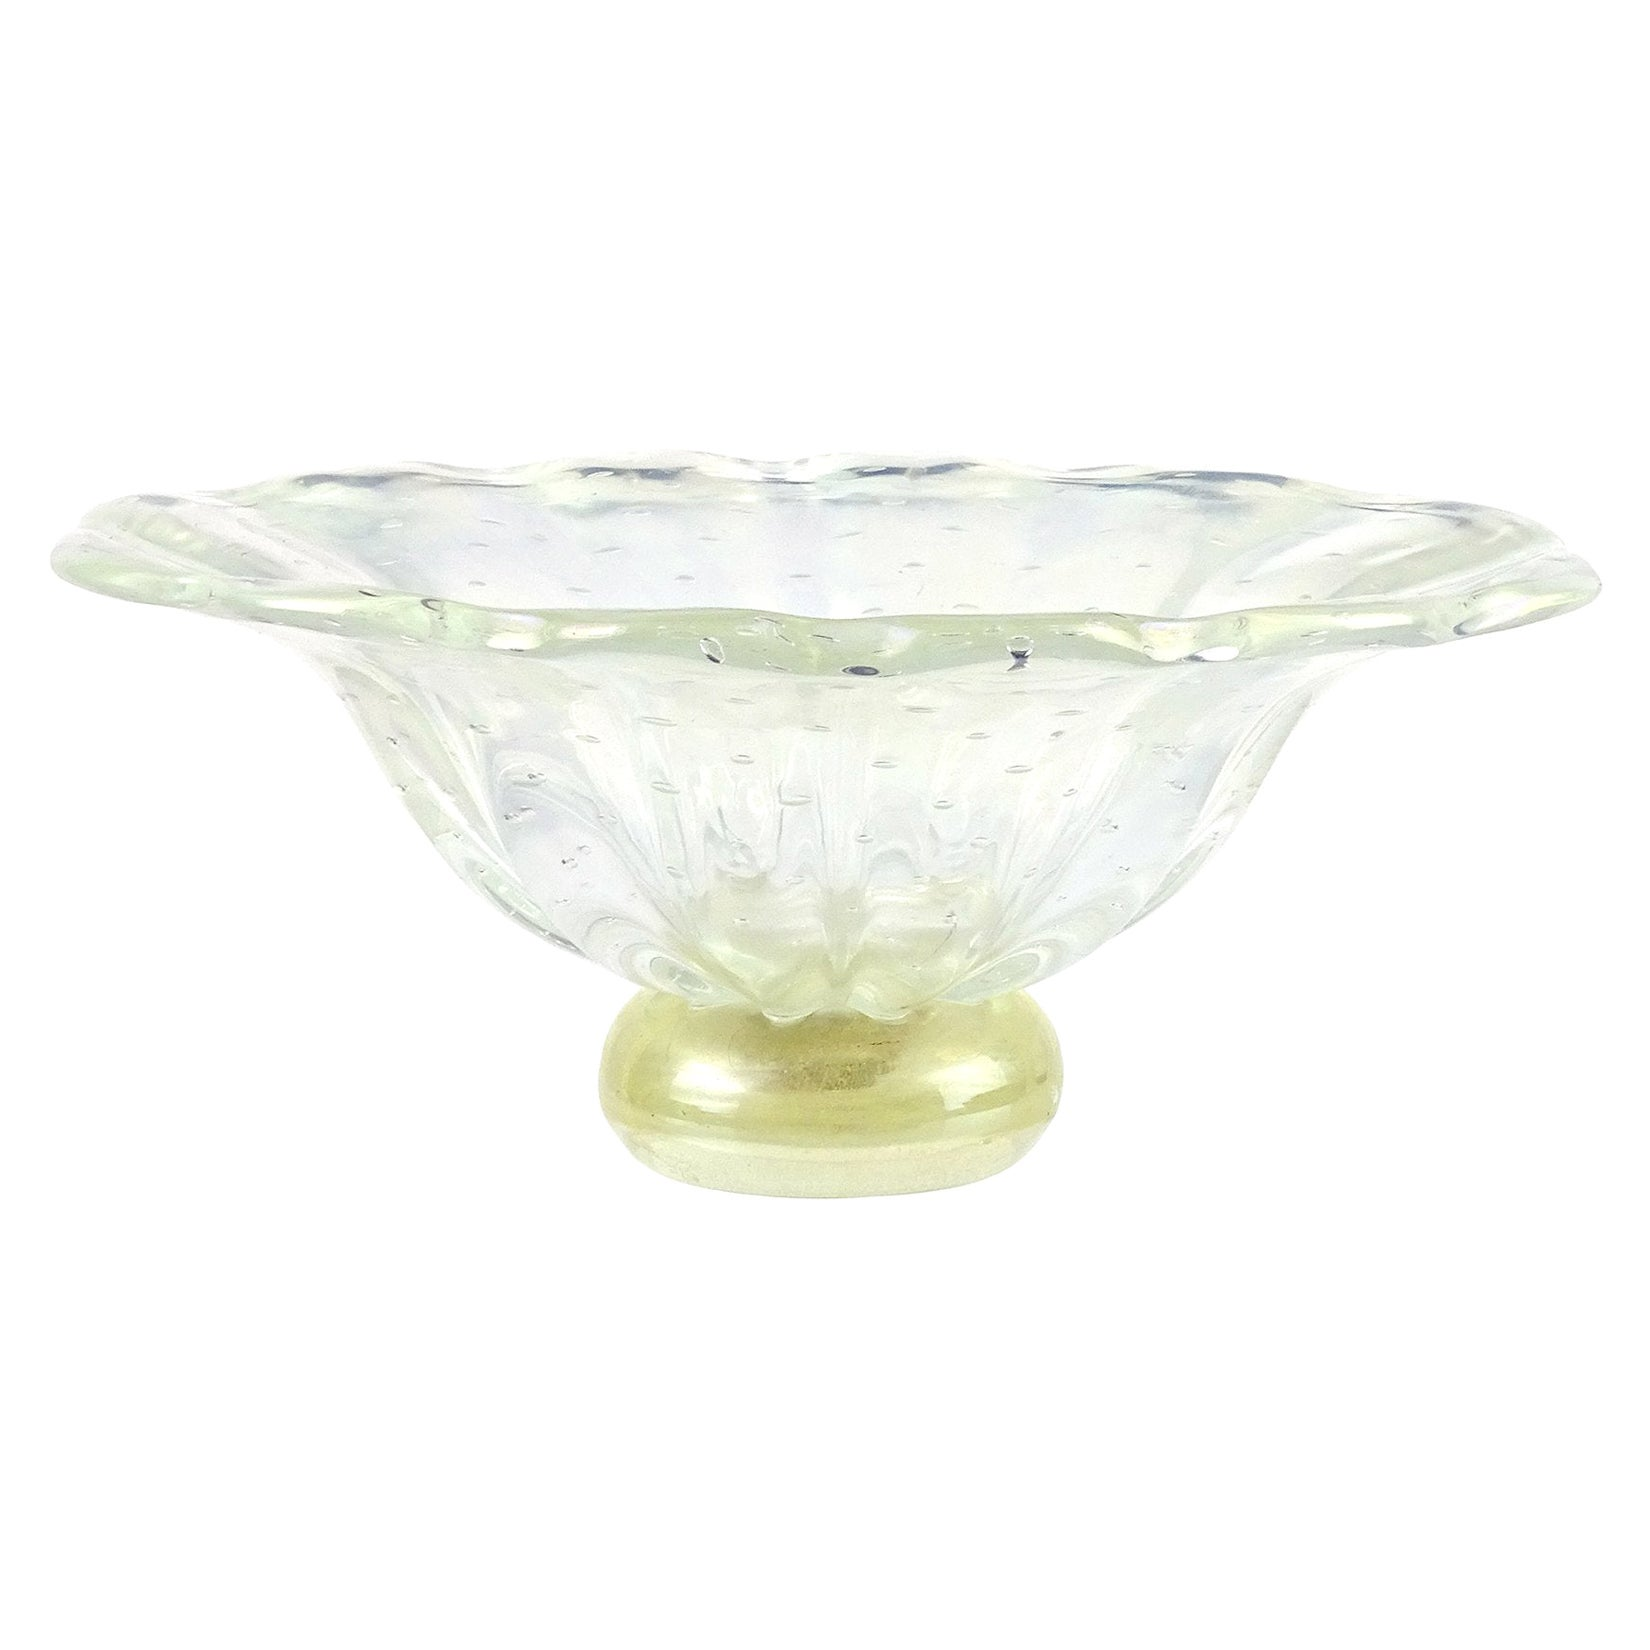 Barovier Toso Murano Iridescent Gold Flecks Italian Art Glass Centerpiece Bowl